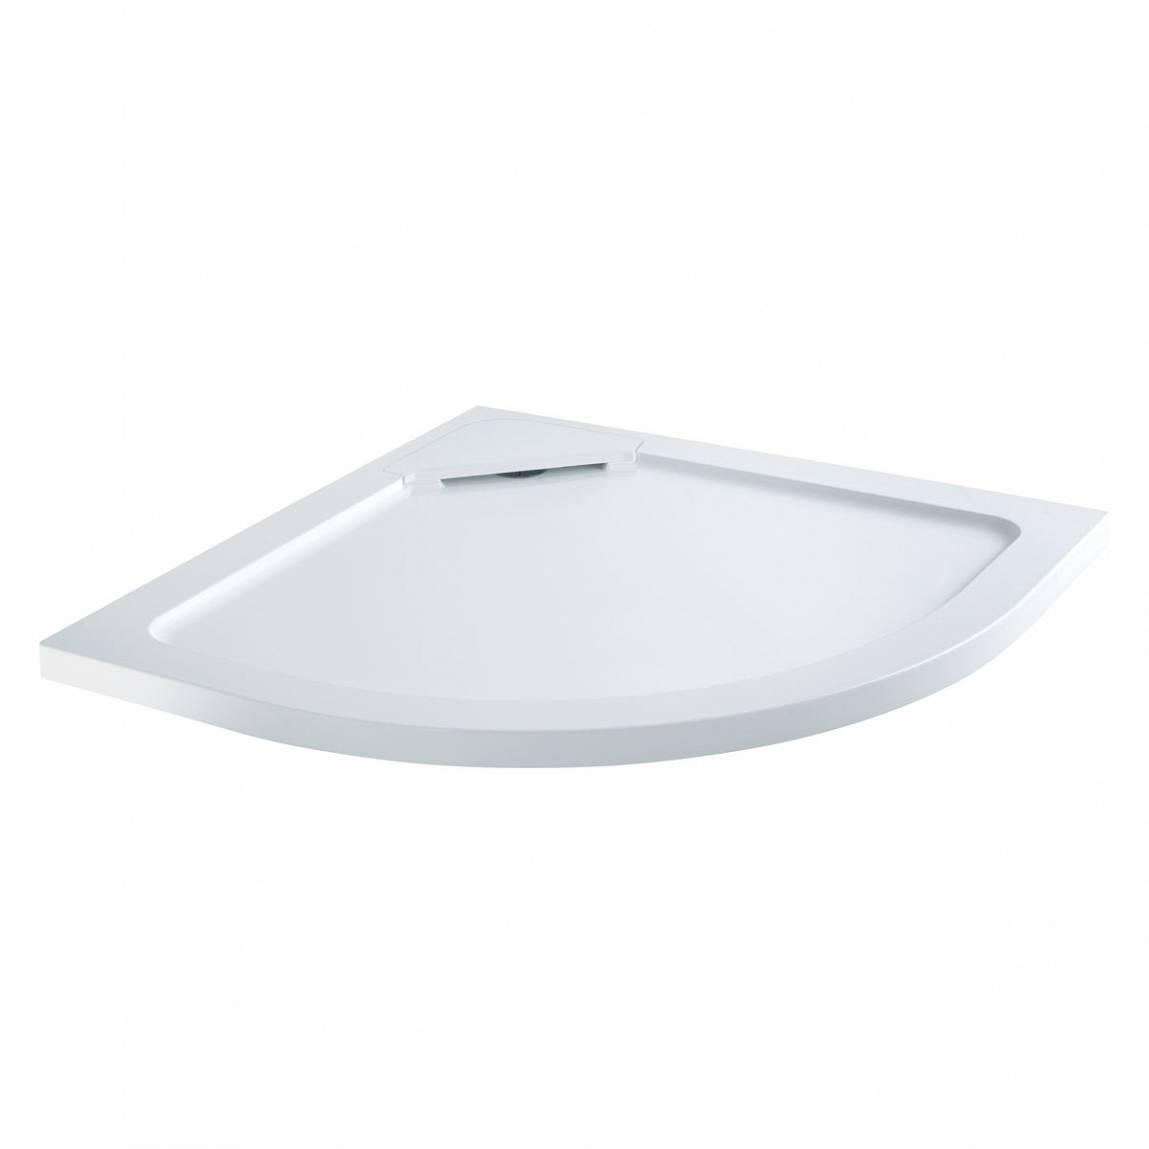 Image of Designer Quadrant Stone Shower Tray 900 x 900